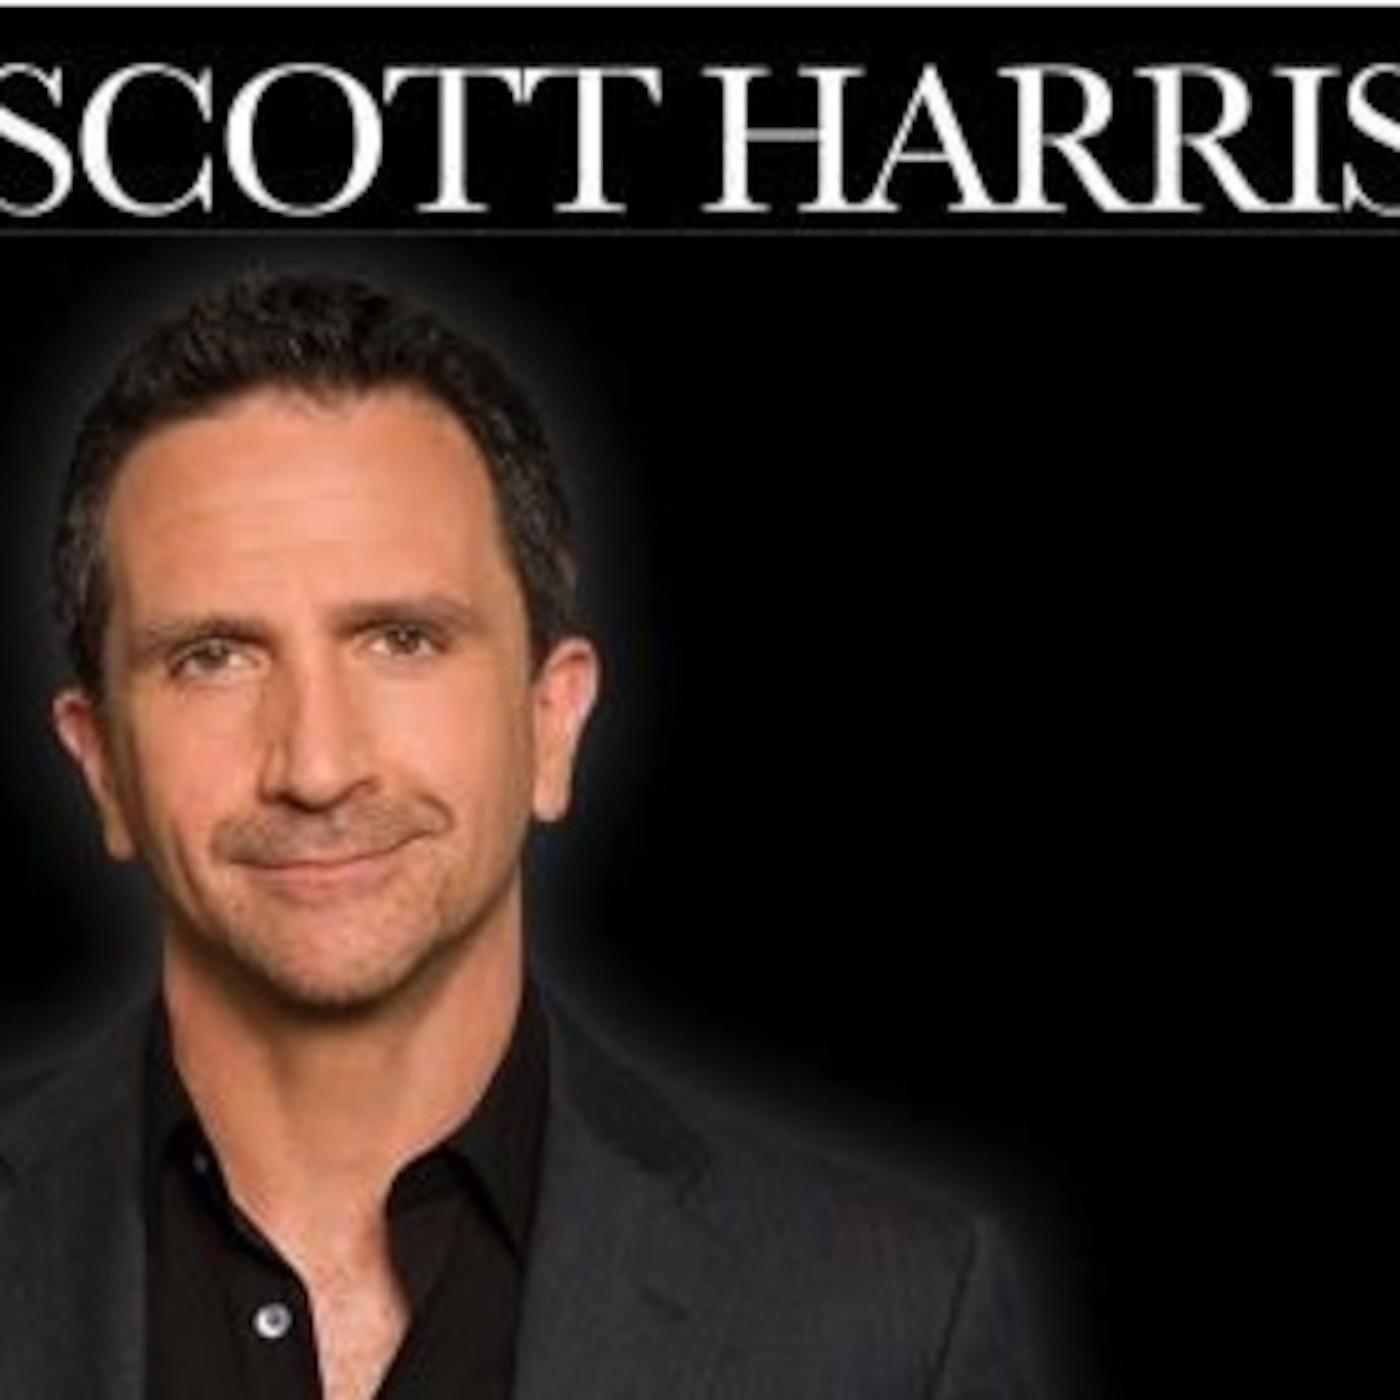 Scott Harris - Ultimate Coach & Millionaire Mentor